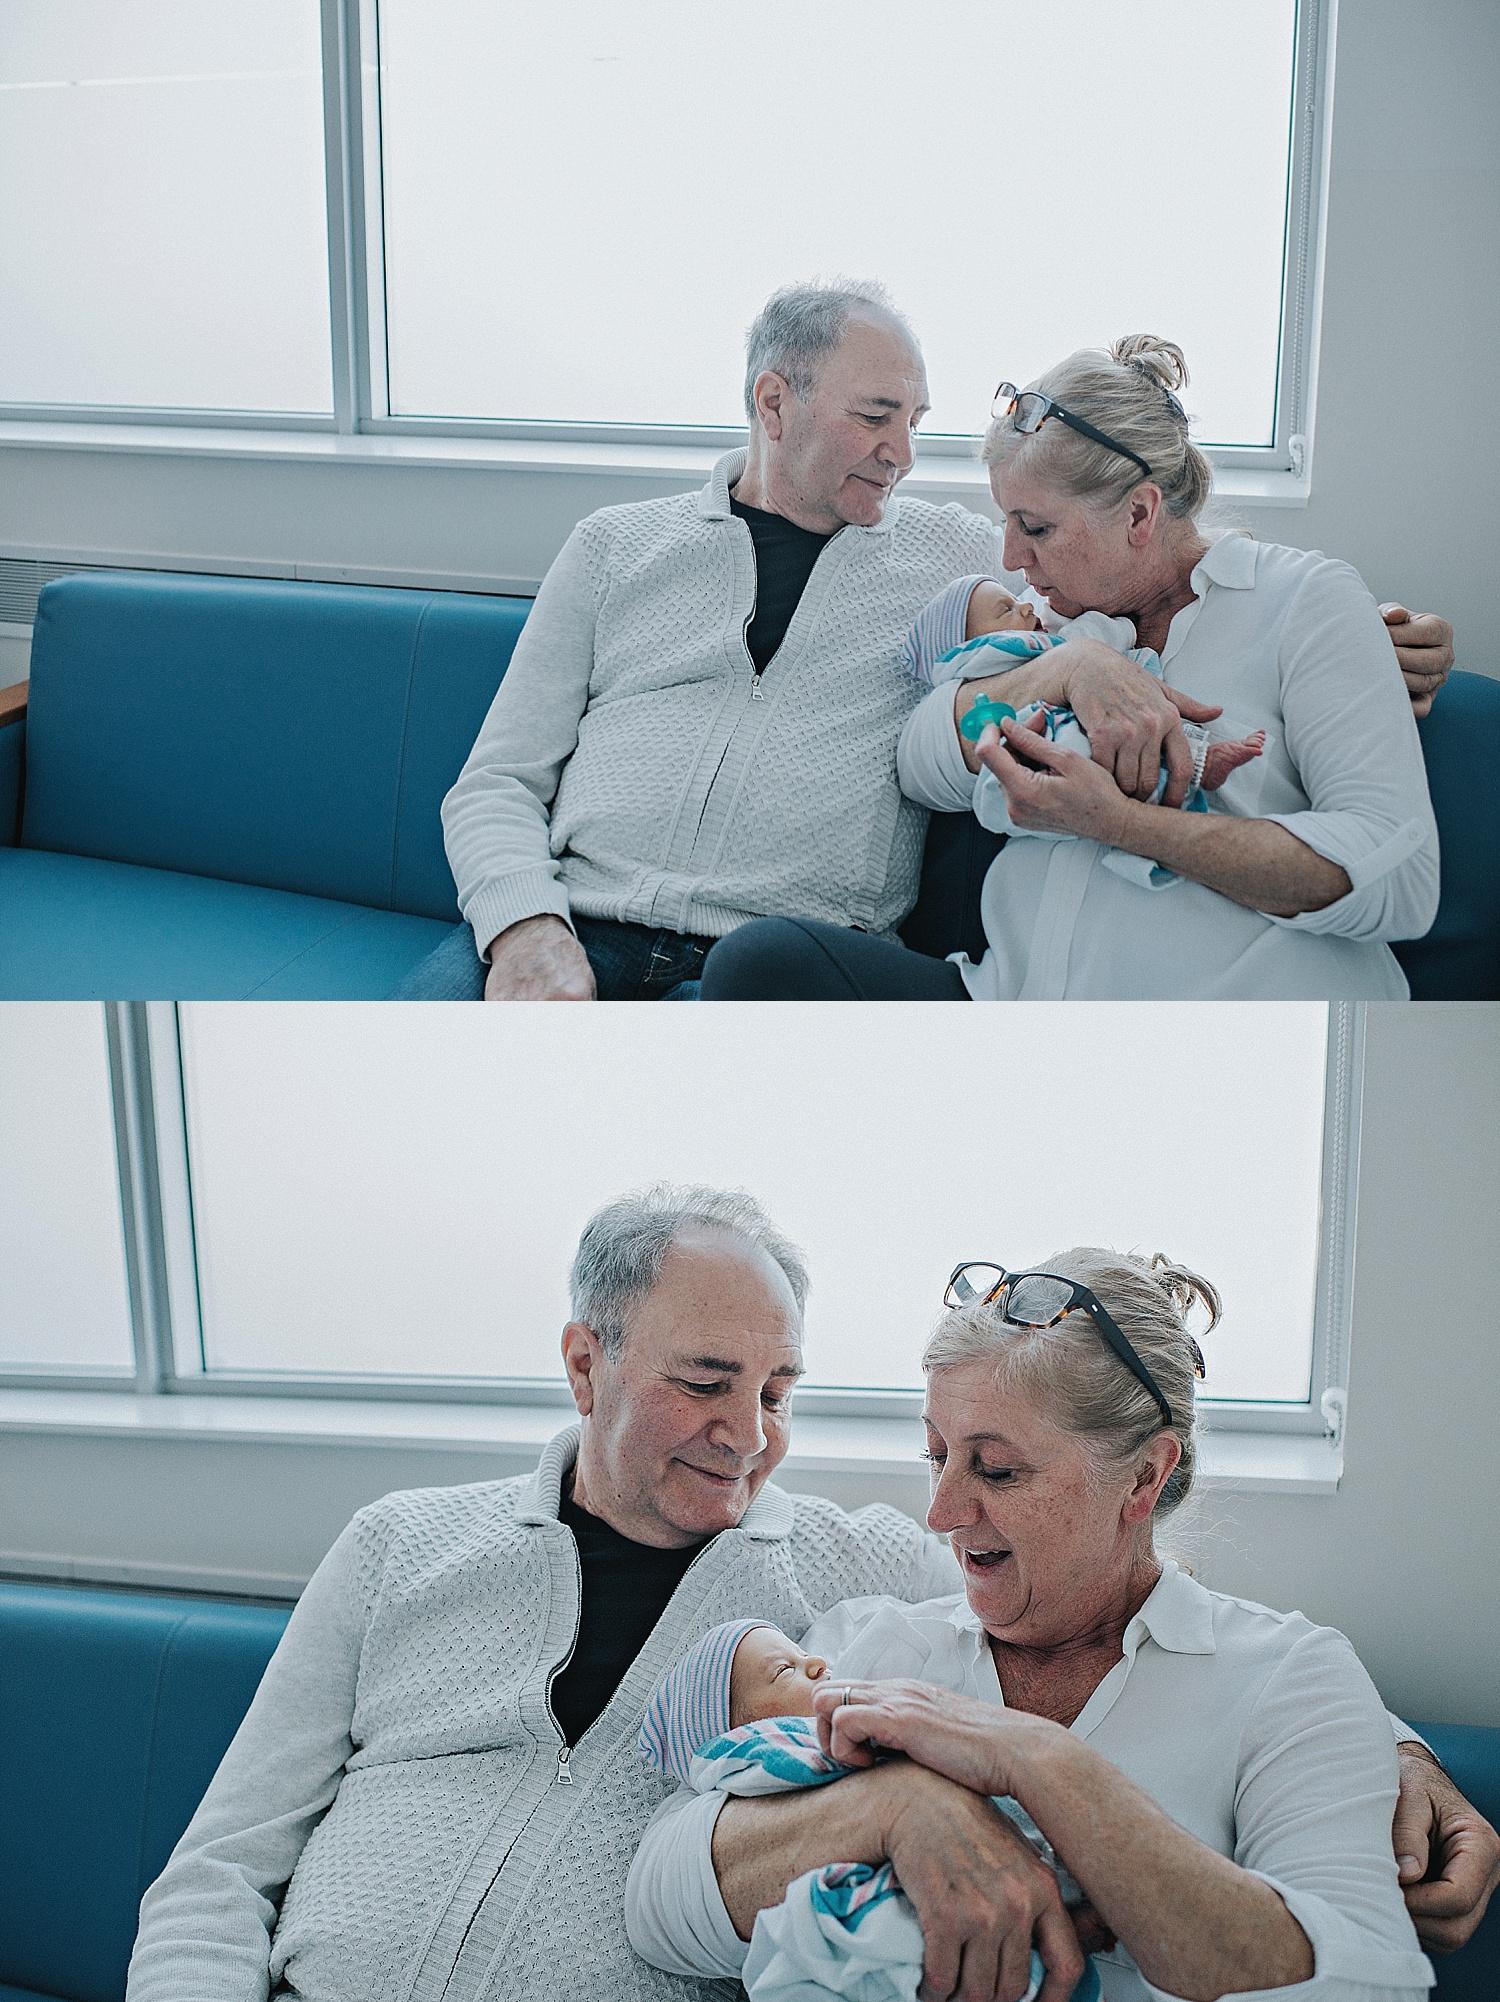 akron-ohio-birth-fresh-48-newborn-baby-family-photographer-akron-canton-cleveland-ohio